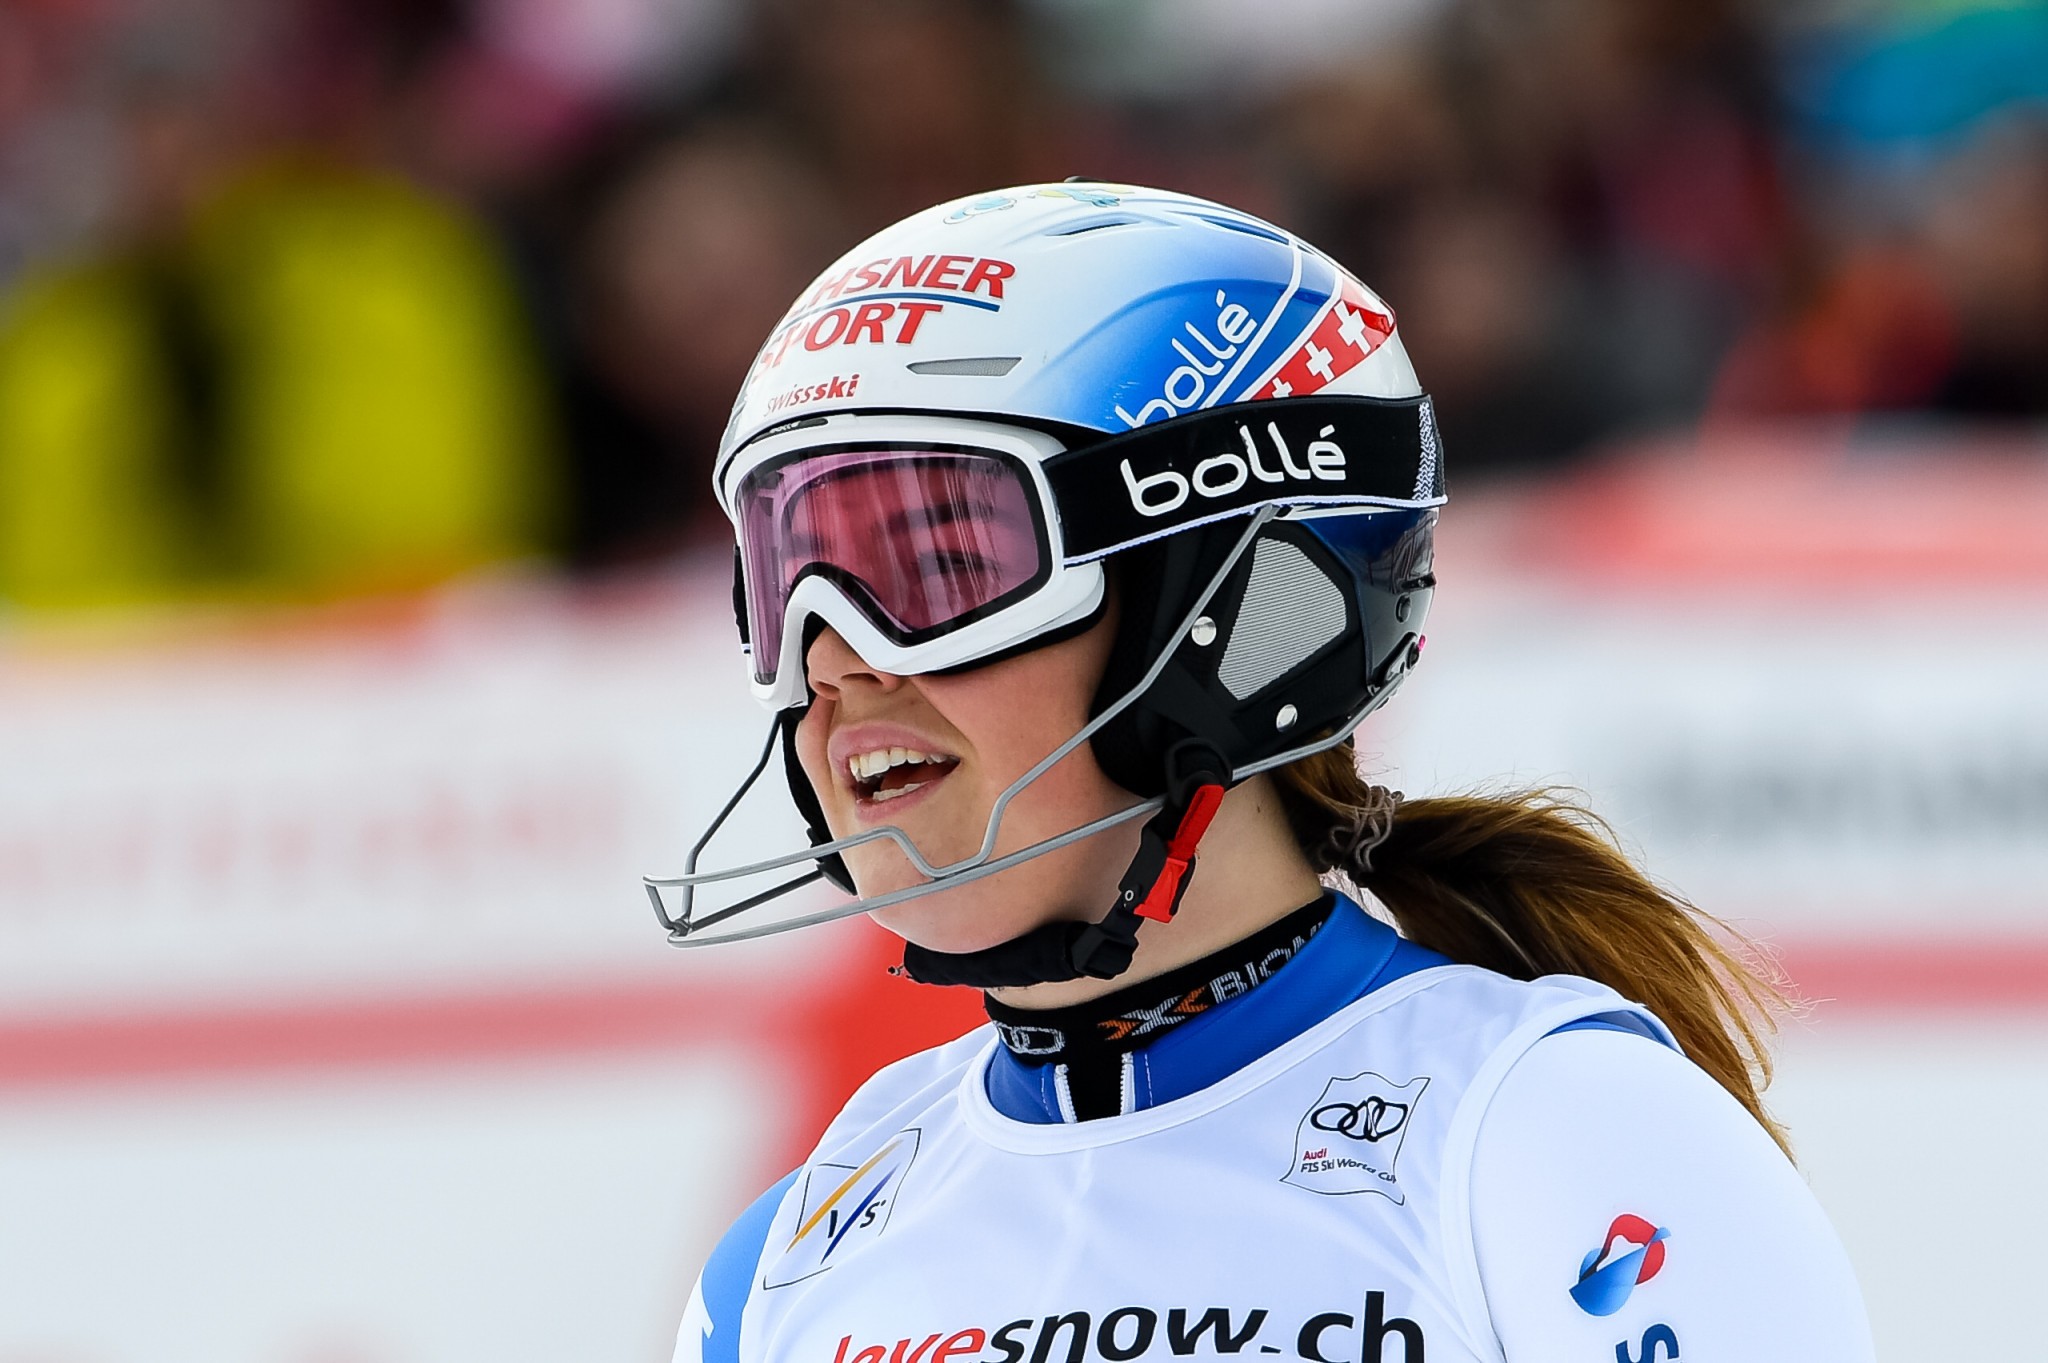 Melanie Meillard has suffered a season-ending injury ©Getty Images